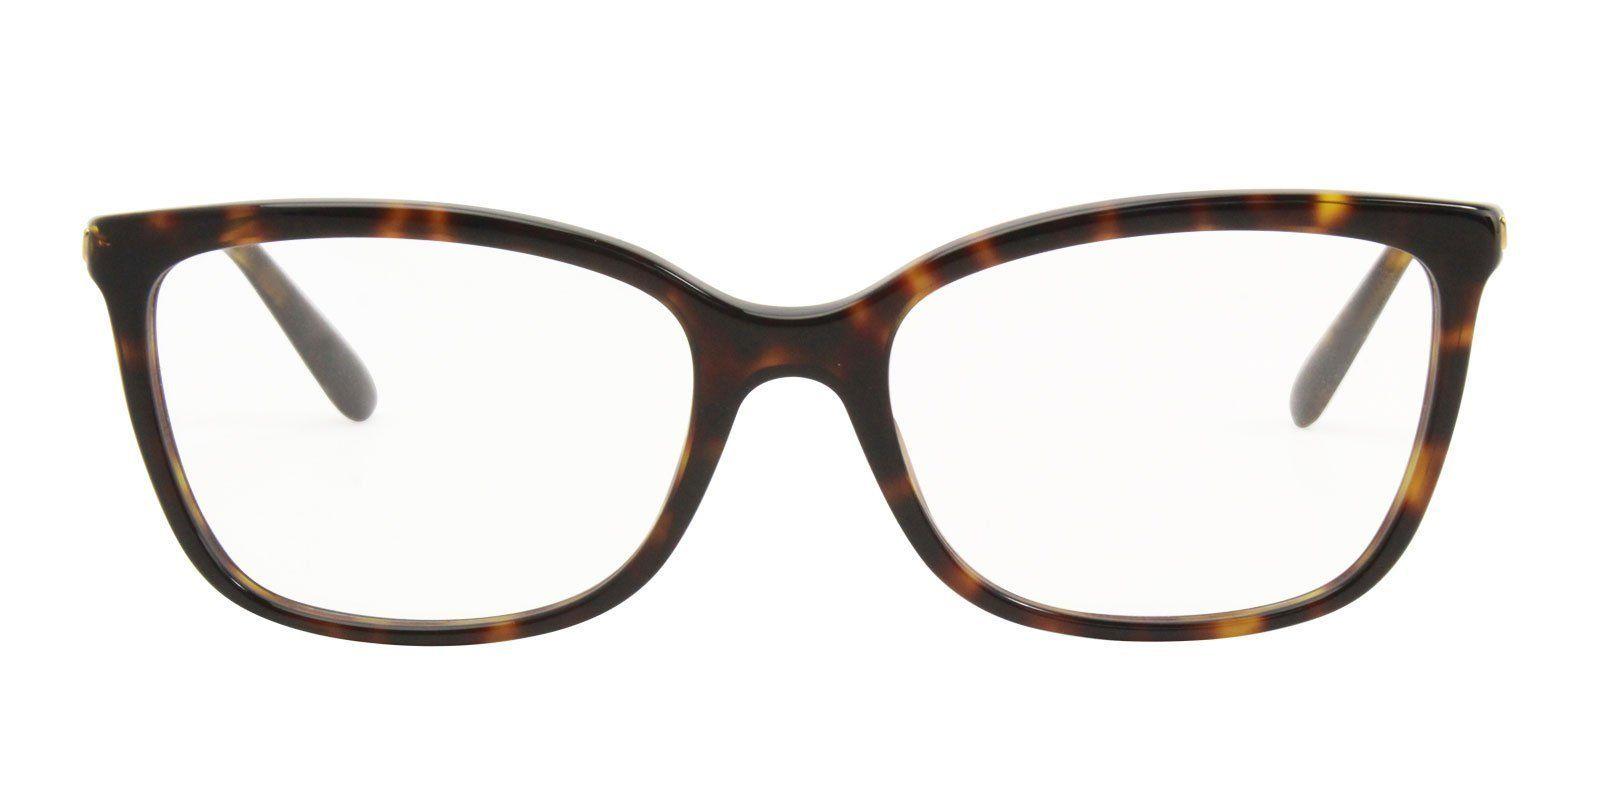 5447e1c0824 Discover ideas about Tortoise. Dolce Gabbana - DG3278 Tortoise eyeglasses